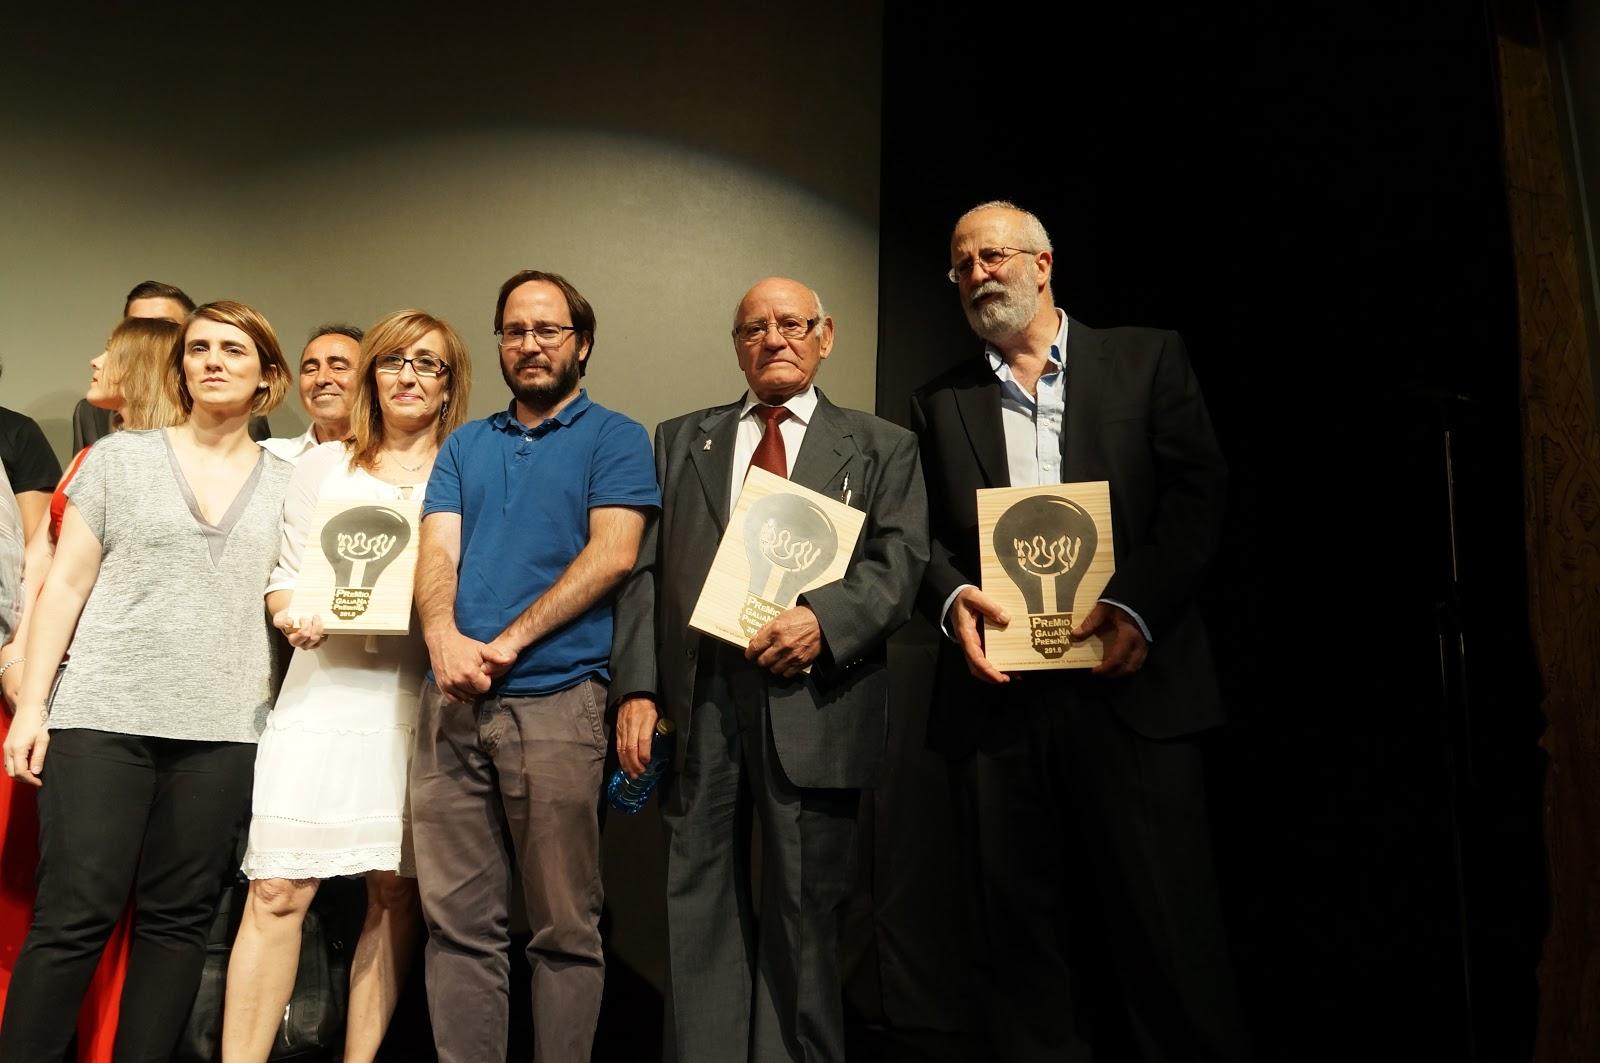 Premios Galiana Presenta 201.7